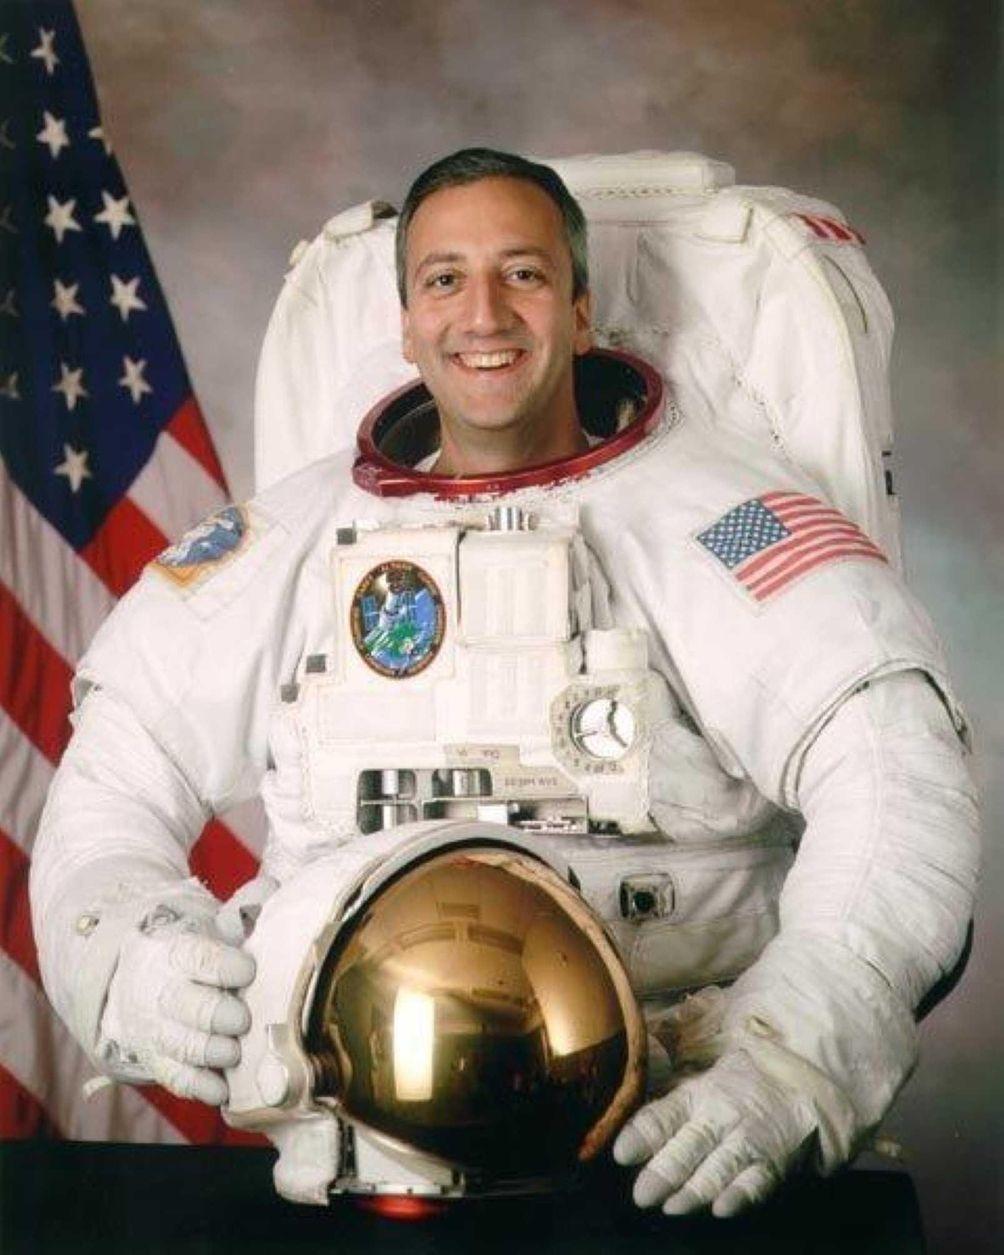 Astronaut Michael Massimino grew up in Franklin Square